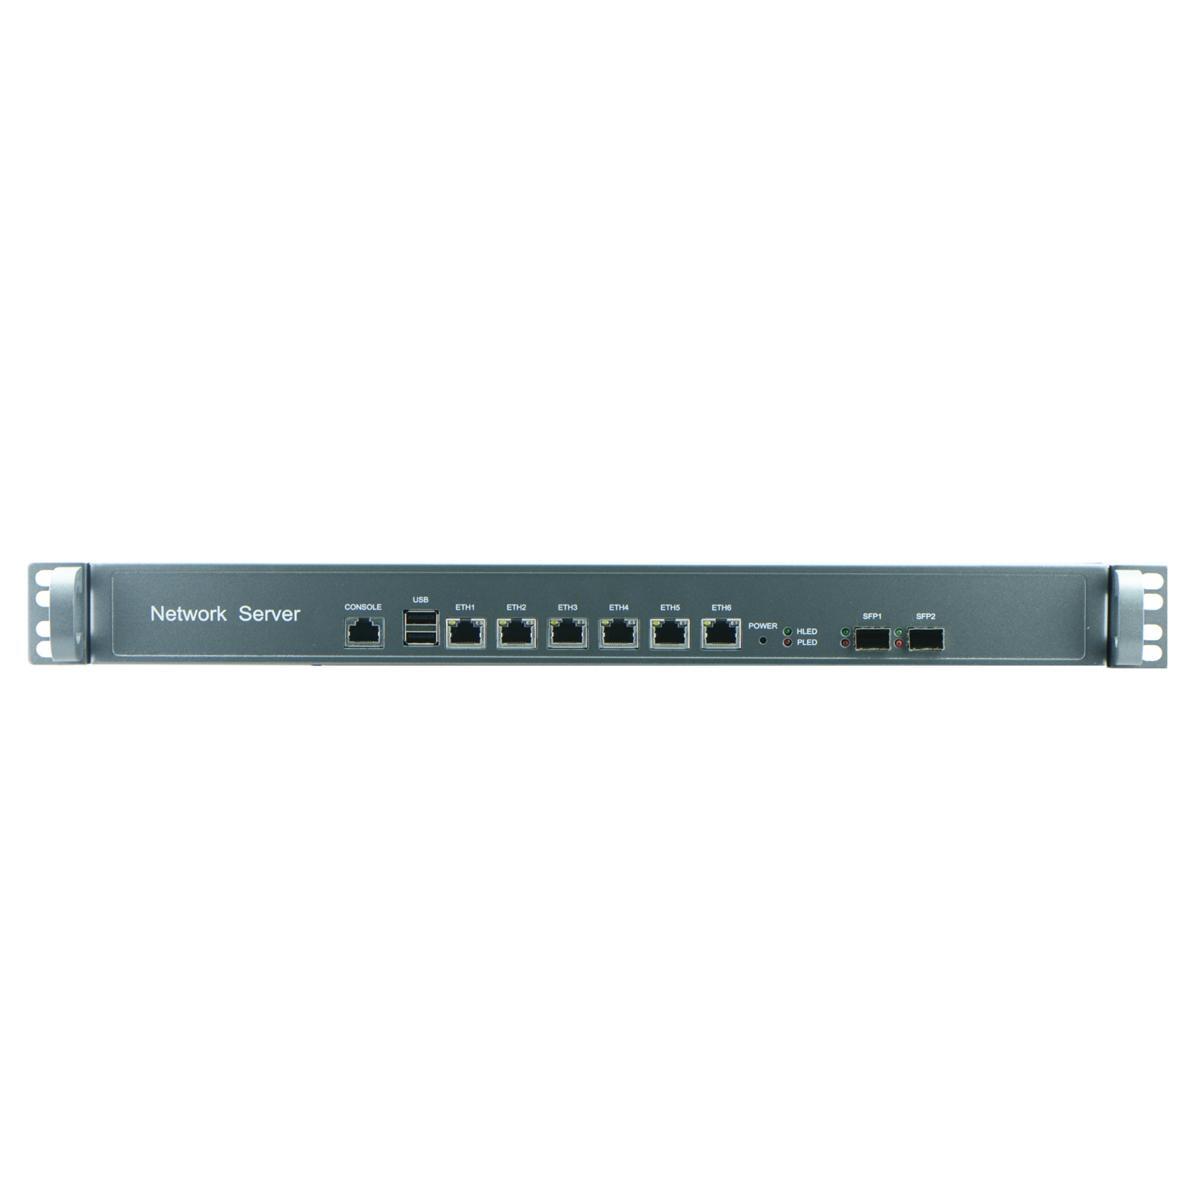 1U B75 Industrial Rackmount Barebone for Network Security 6 Nic SFP 1